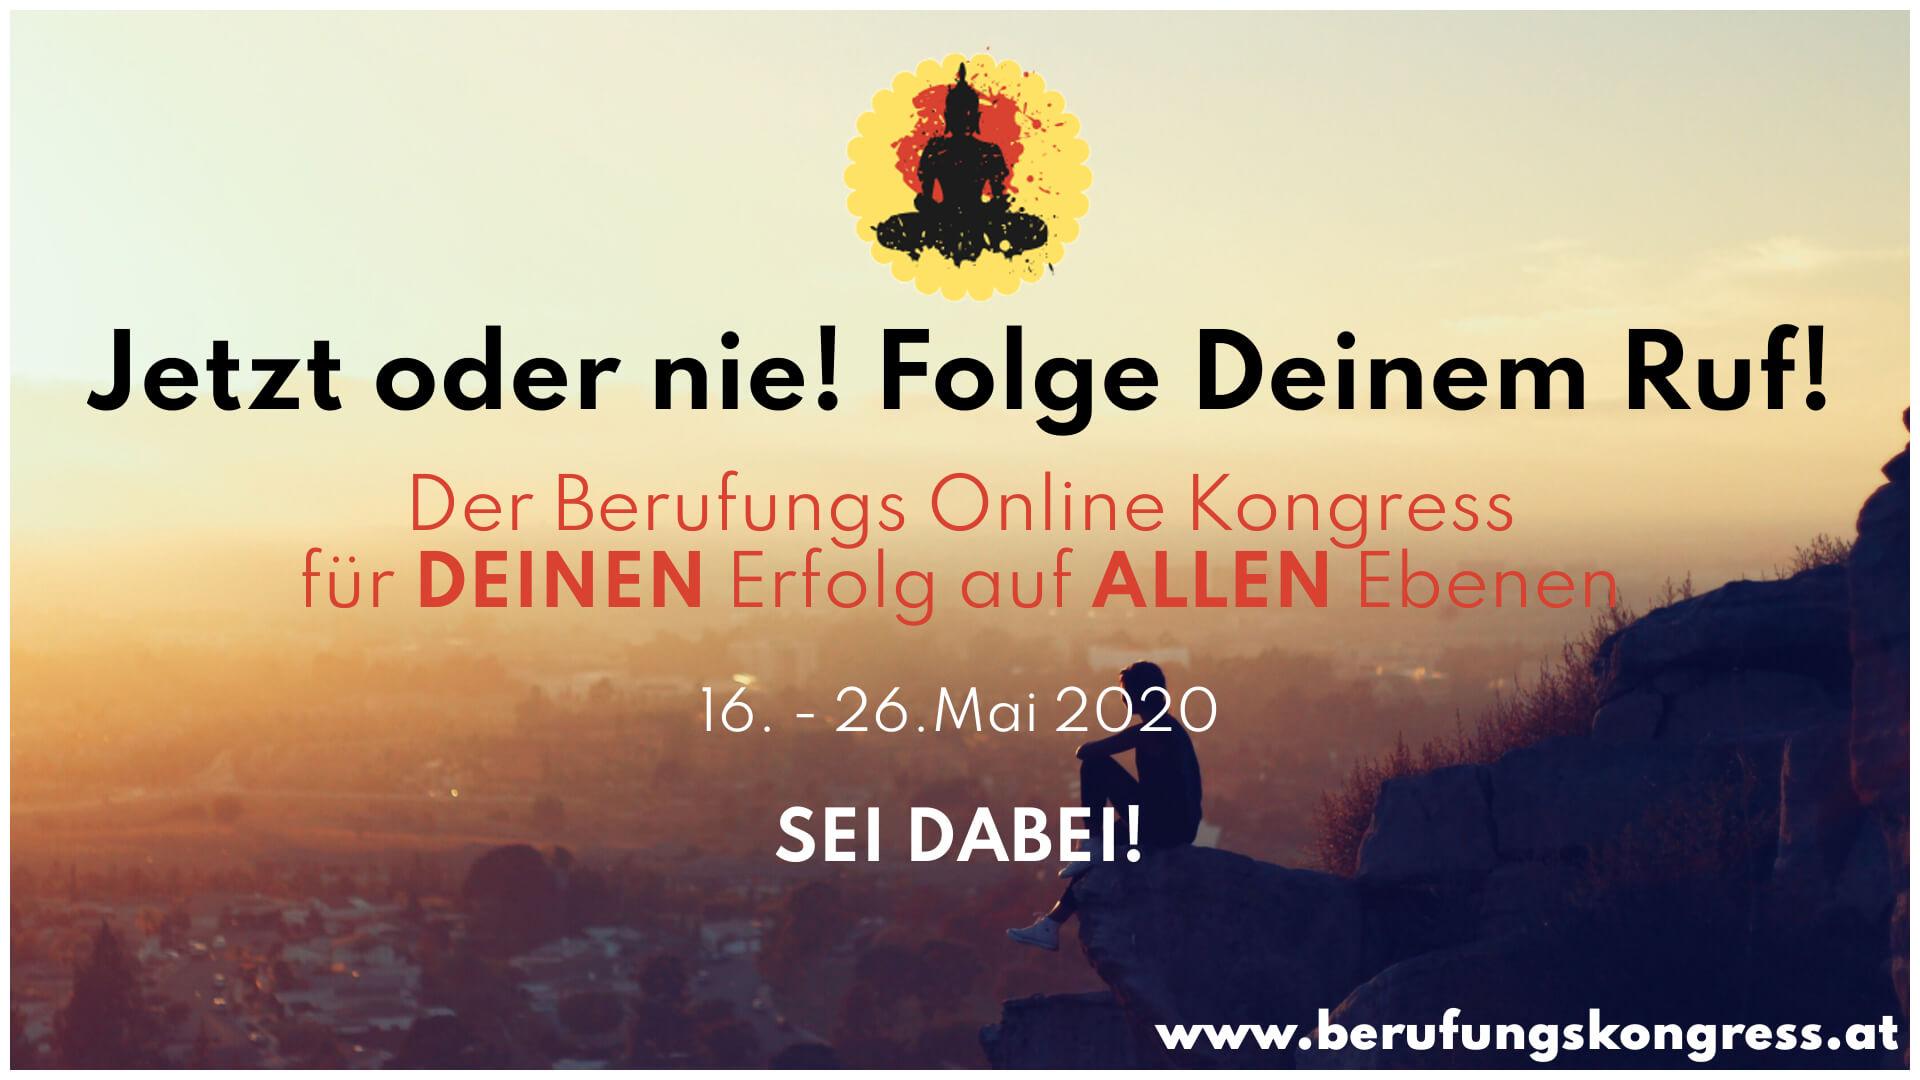 berufungs online kongress